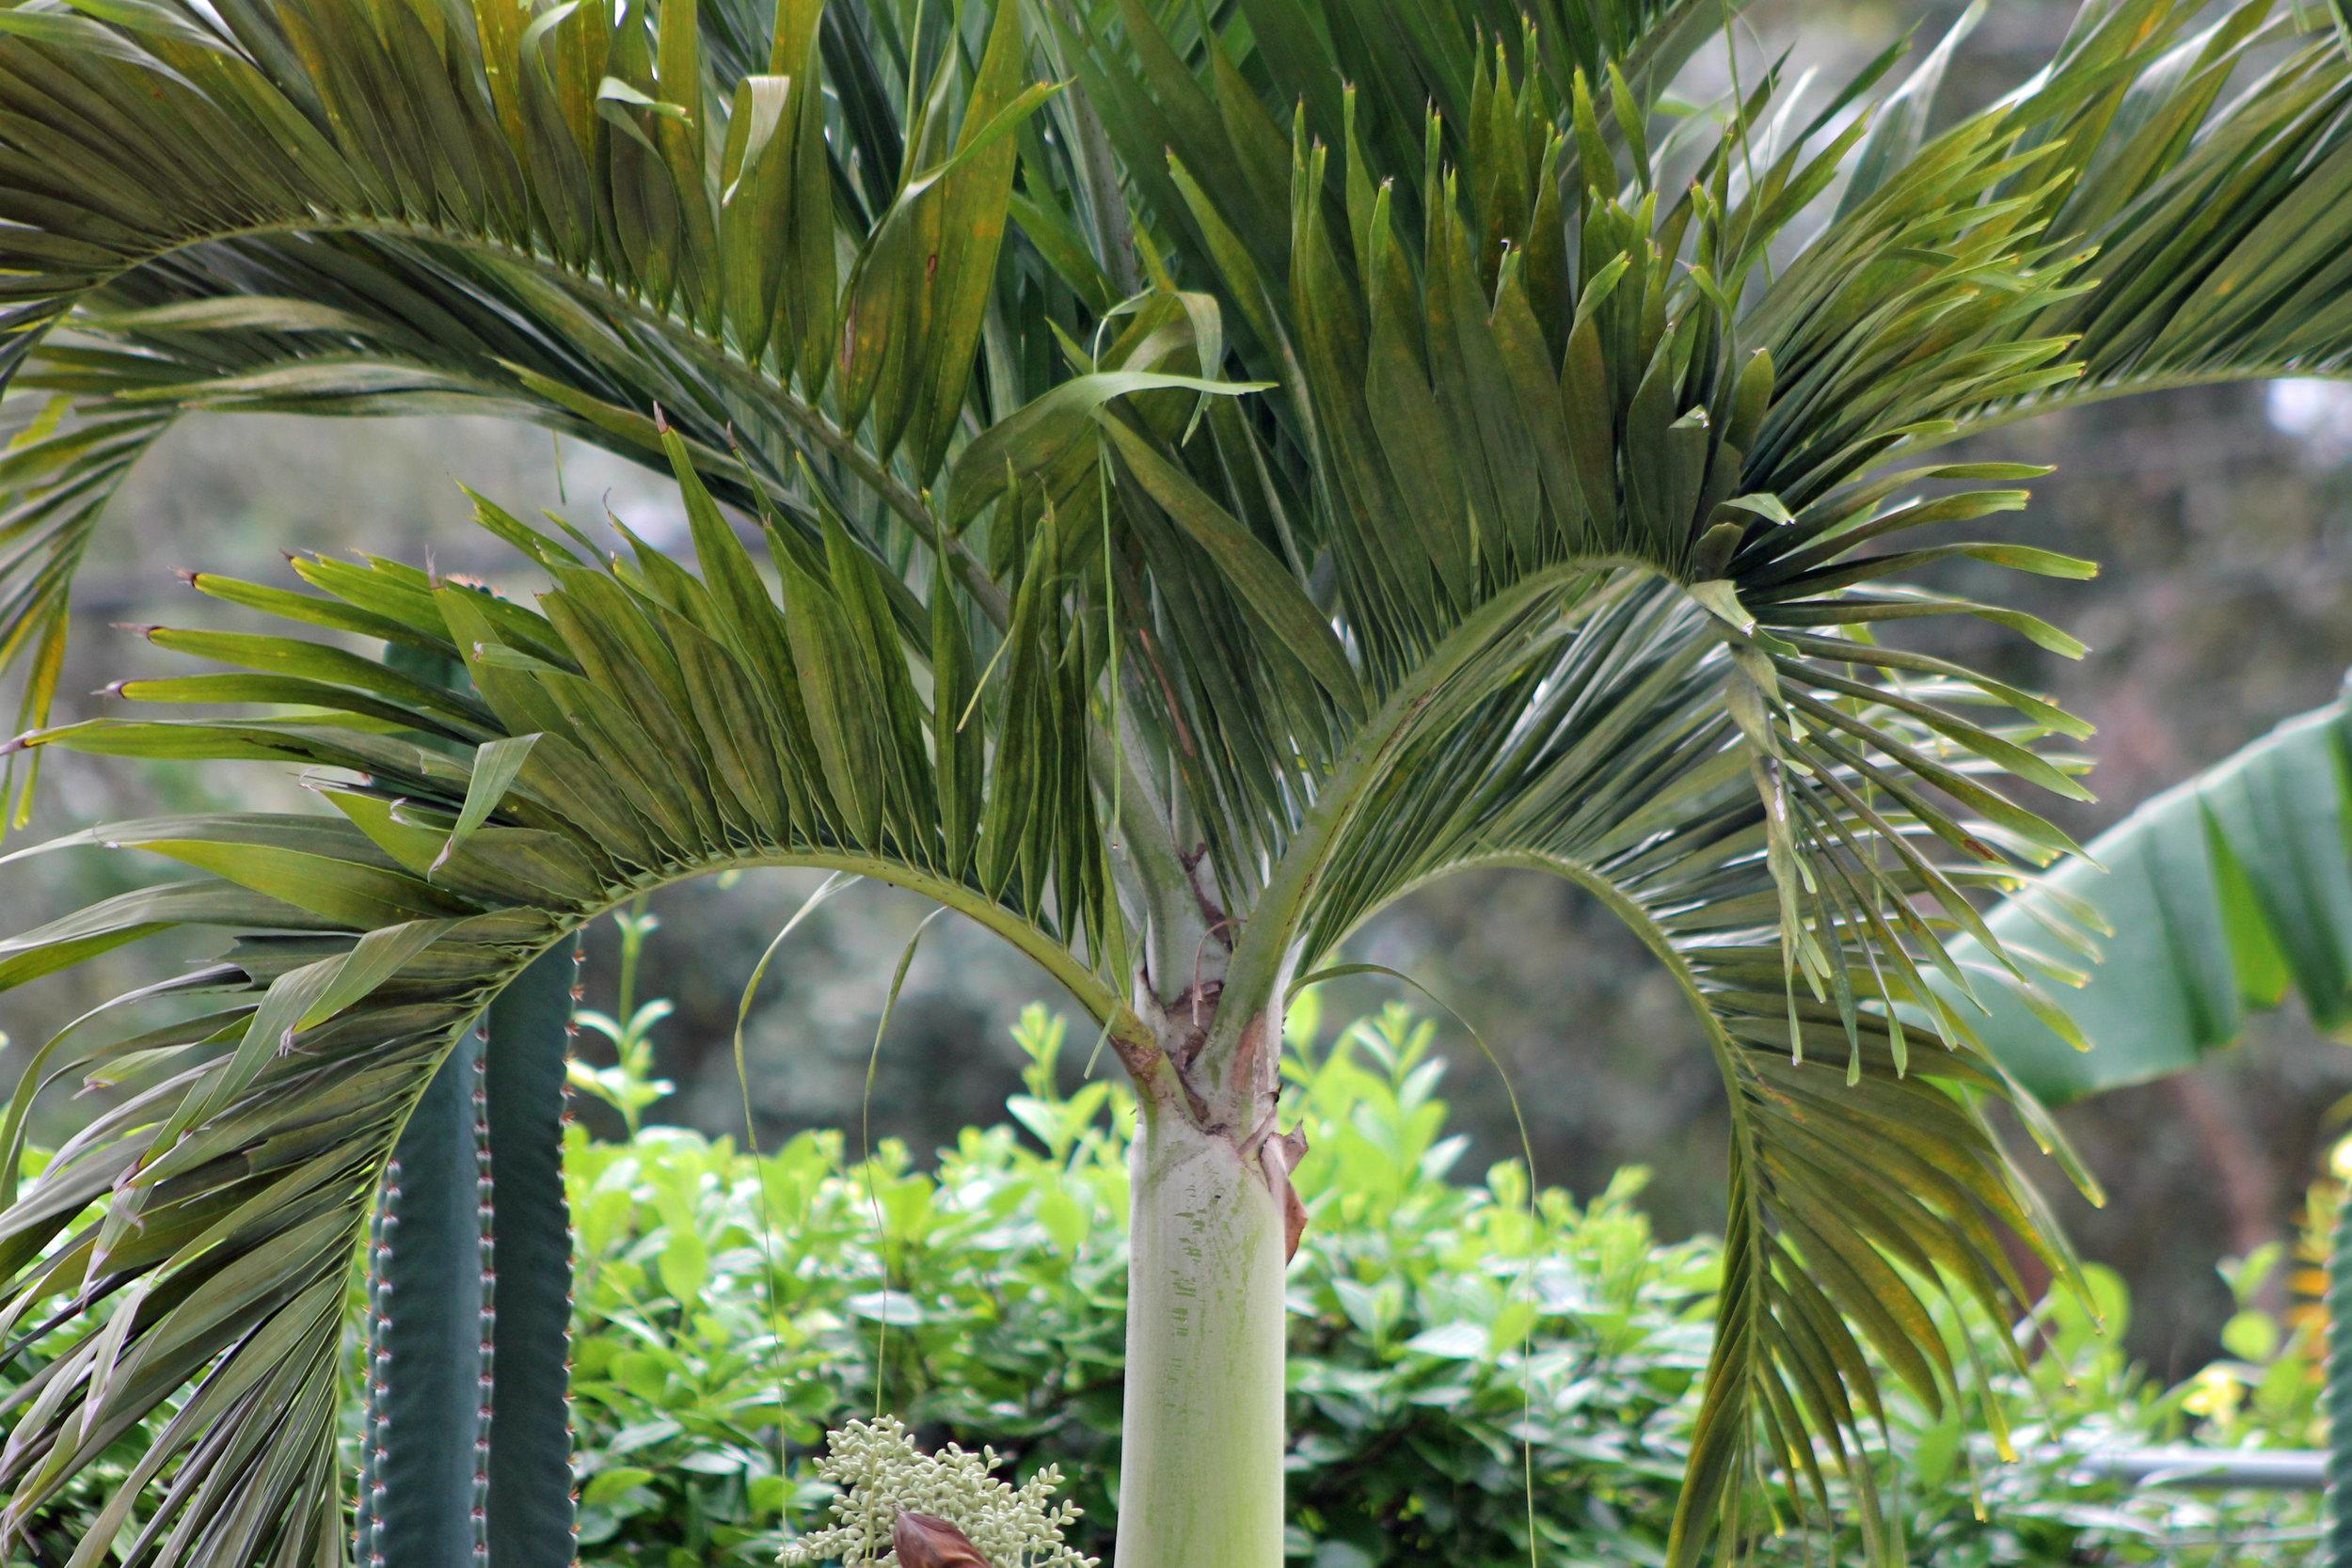 aaaa_Jim_Palm Tree.jpg